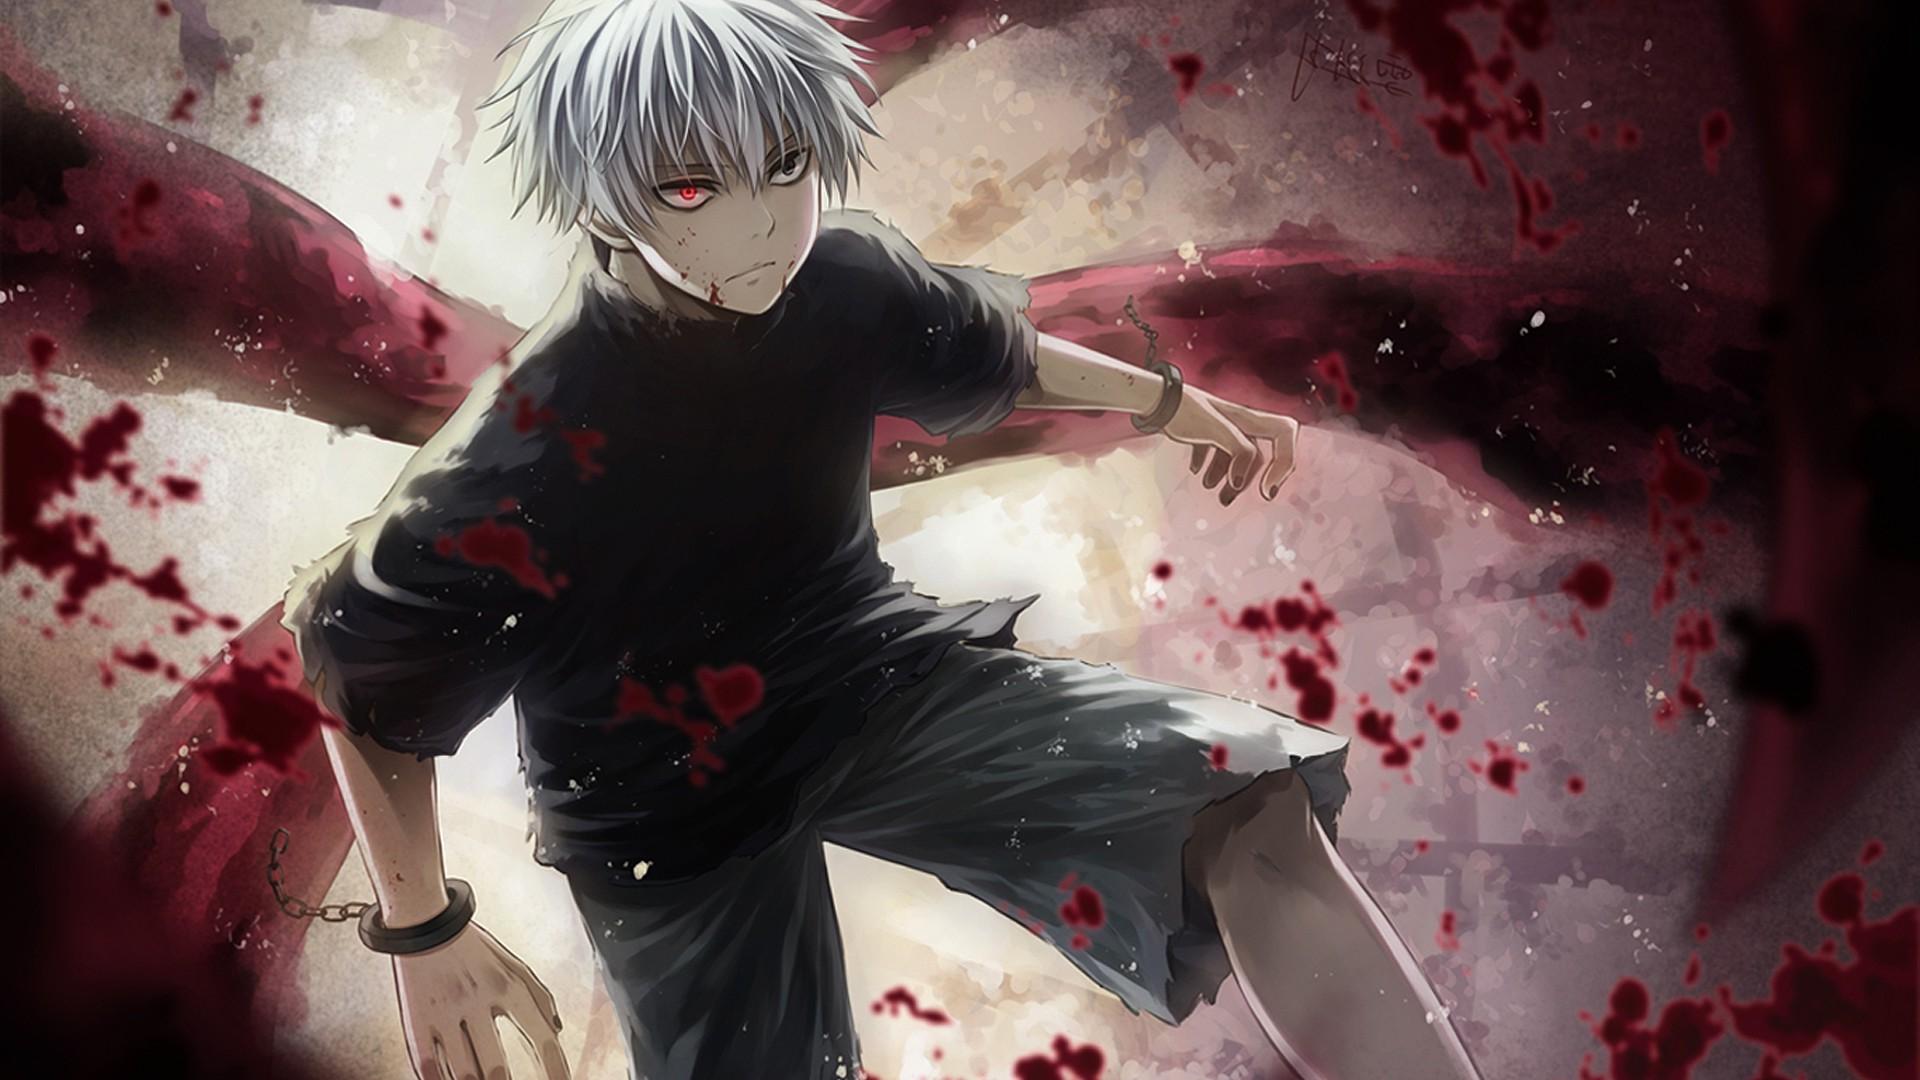 Wallpaper Anime Kaneki Ken Tokyo Ghoul Screenshot 1920x1080 Px